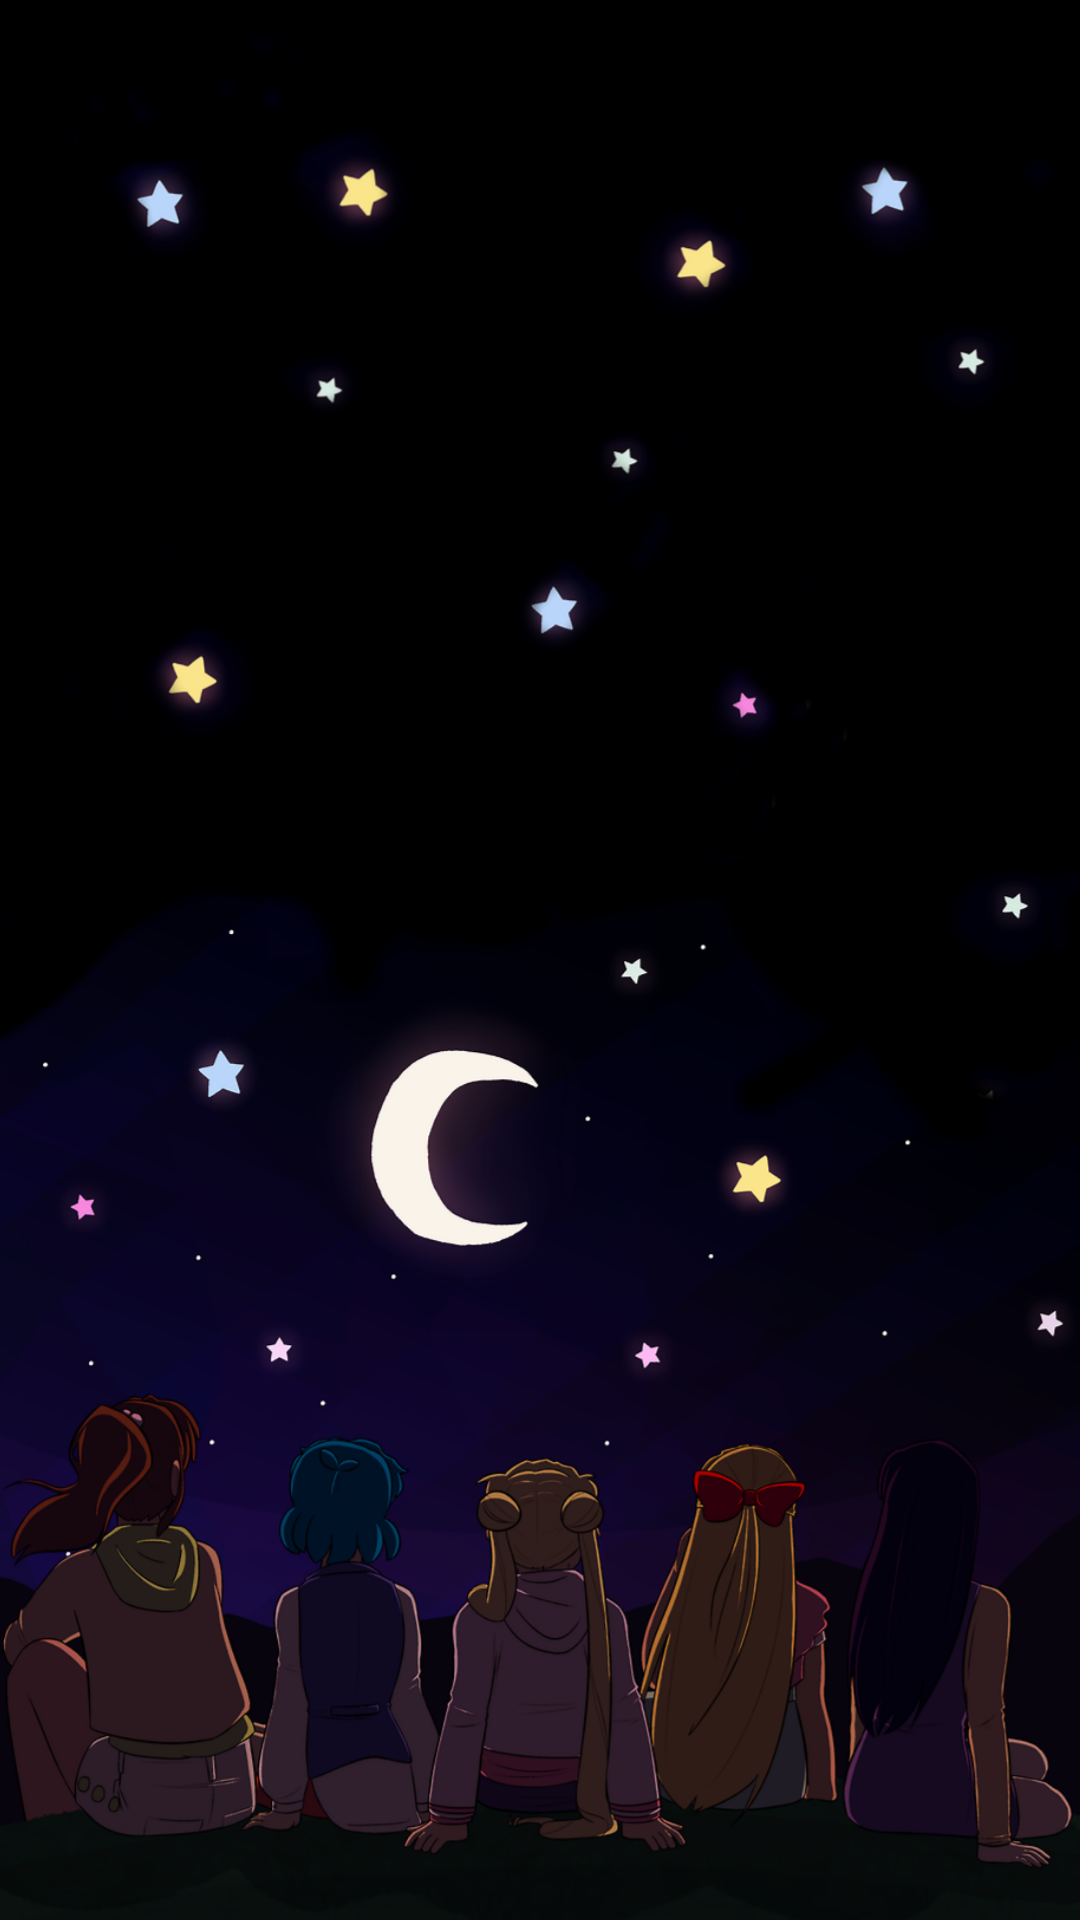 Pin On Sailor Moon Wallpaper